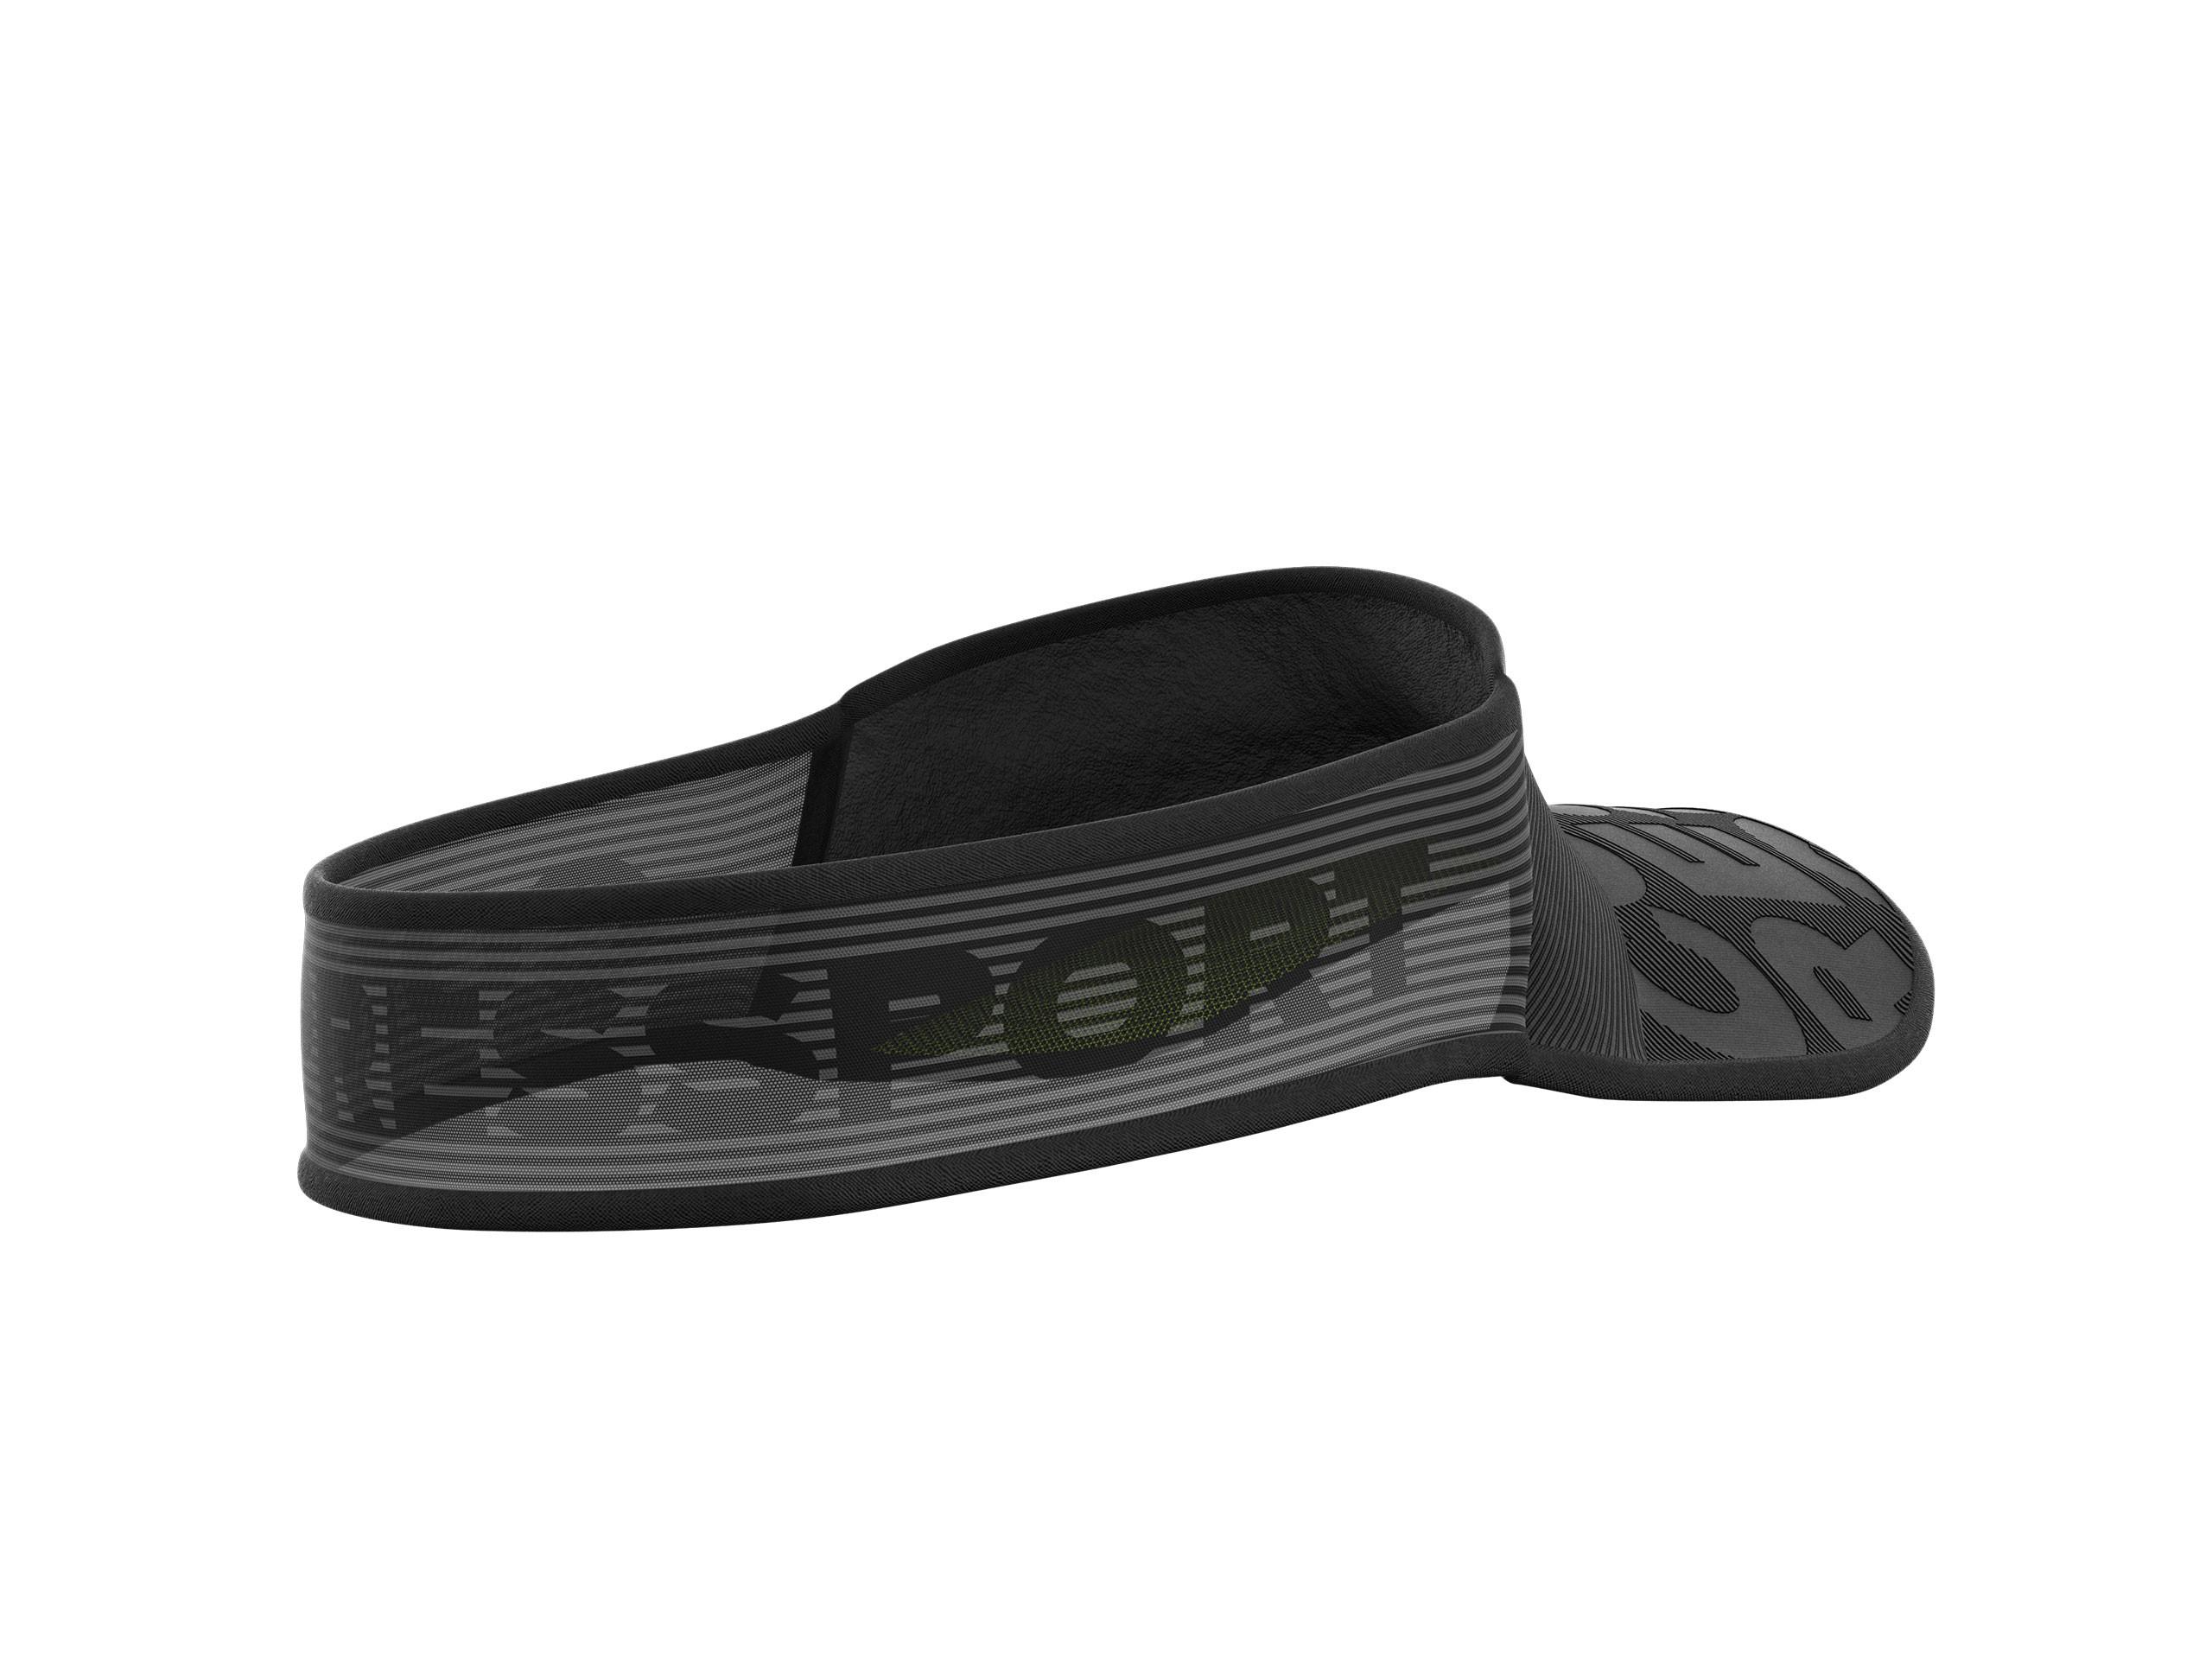 Spiderweb Ultralight Visor - Black Edition 2019 BLACK